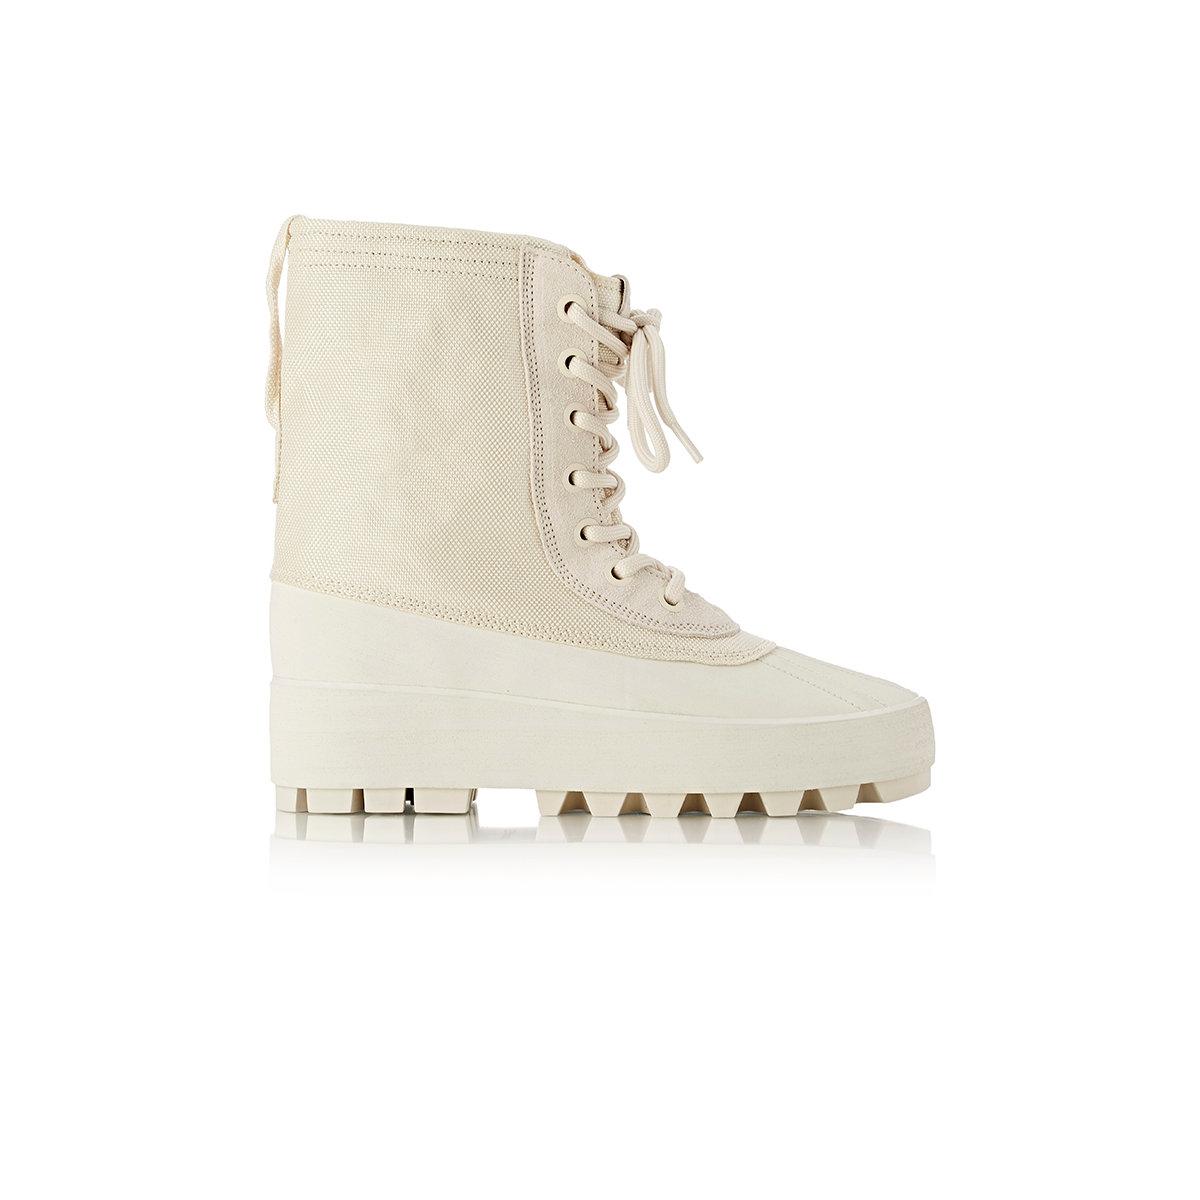 f1ecb46408313 Lyst - Yeezy Yeezy 950 Boots in White